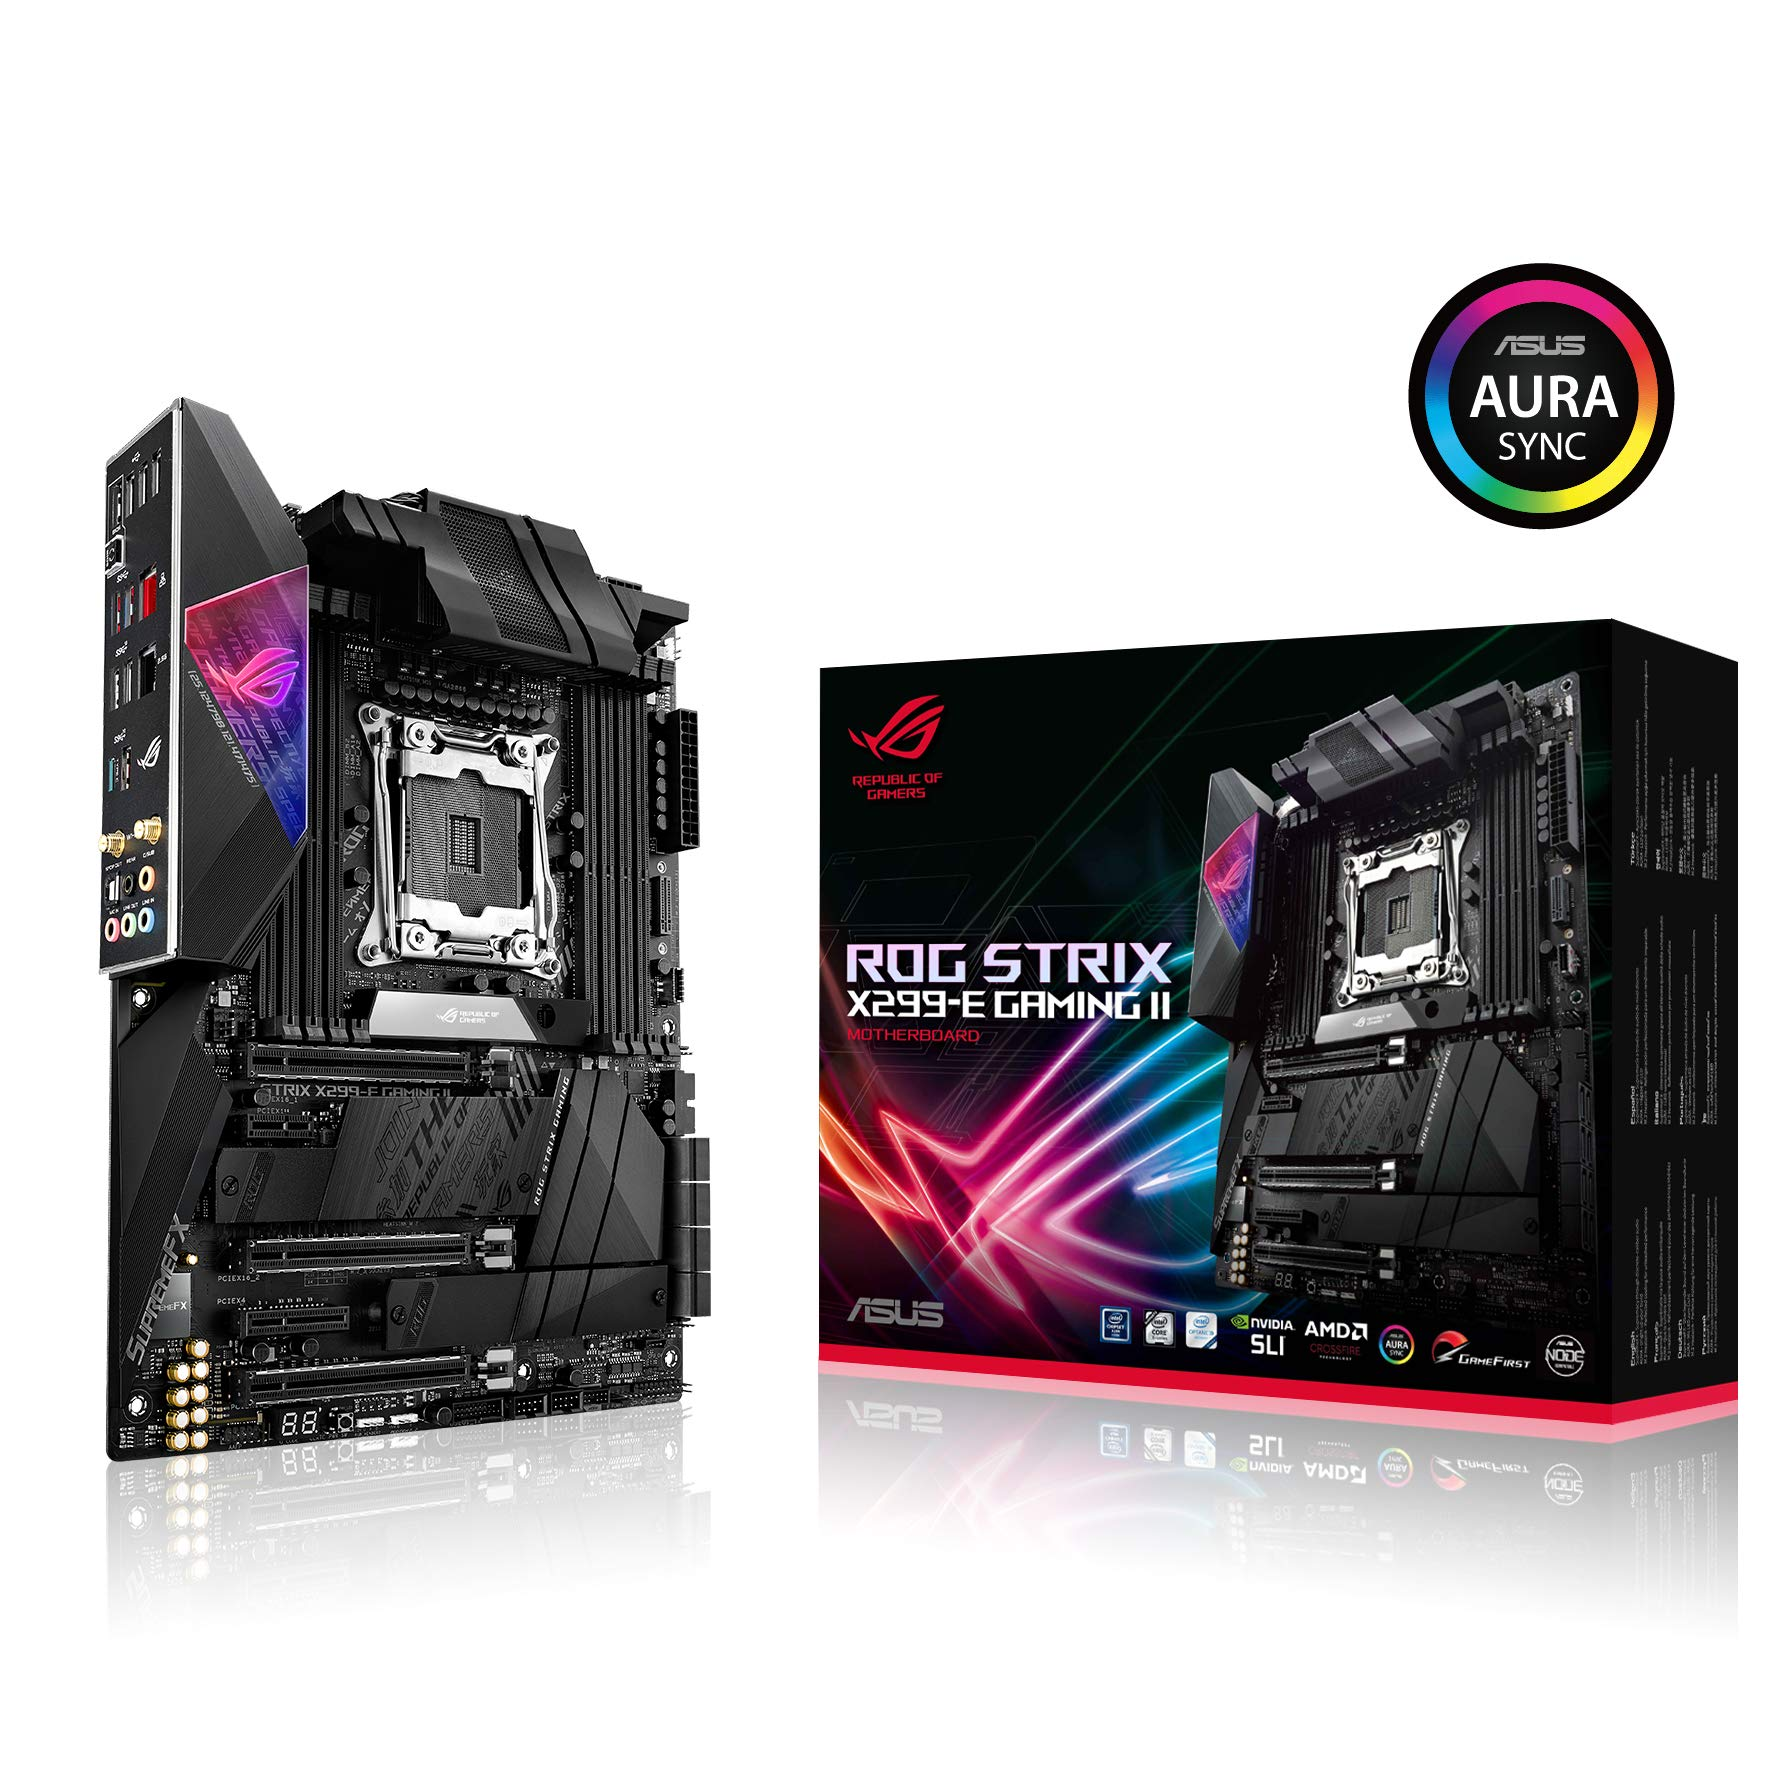 Asus Rog Strix X299-e Gaming Ii Atx Gaming Motherboard (i...